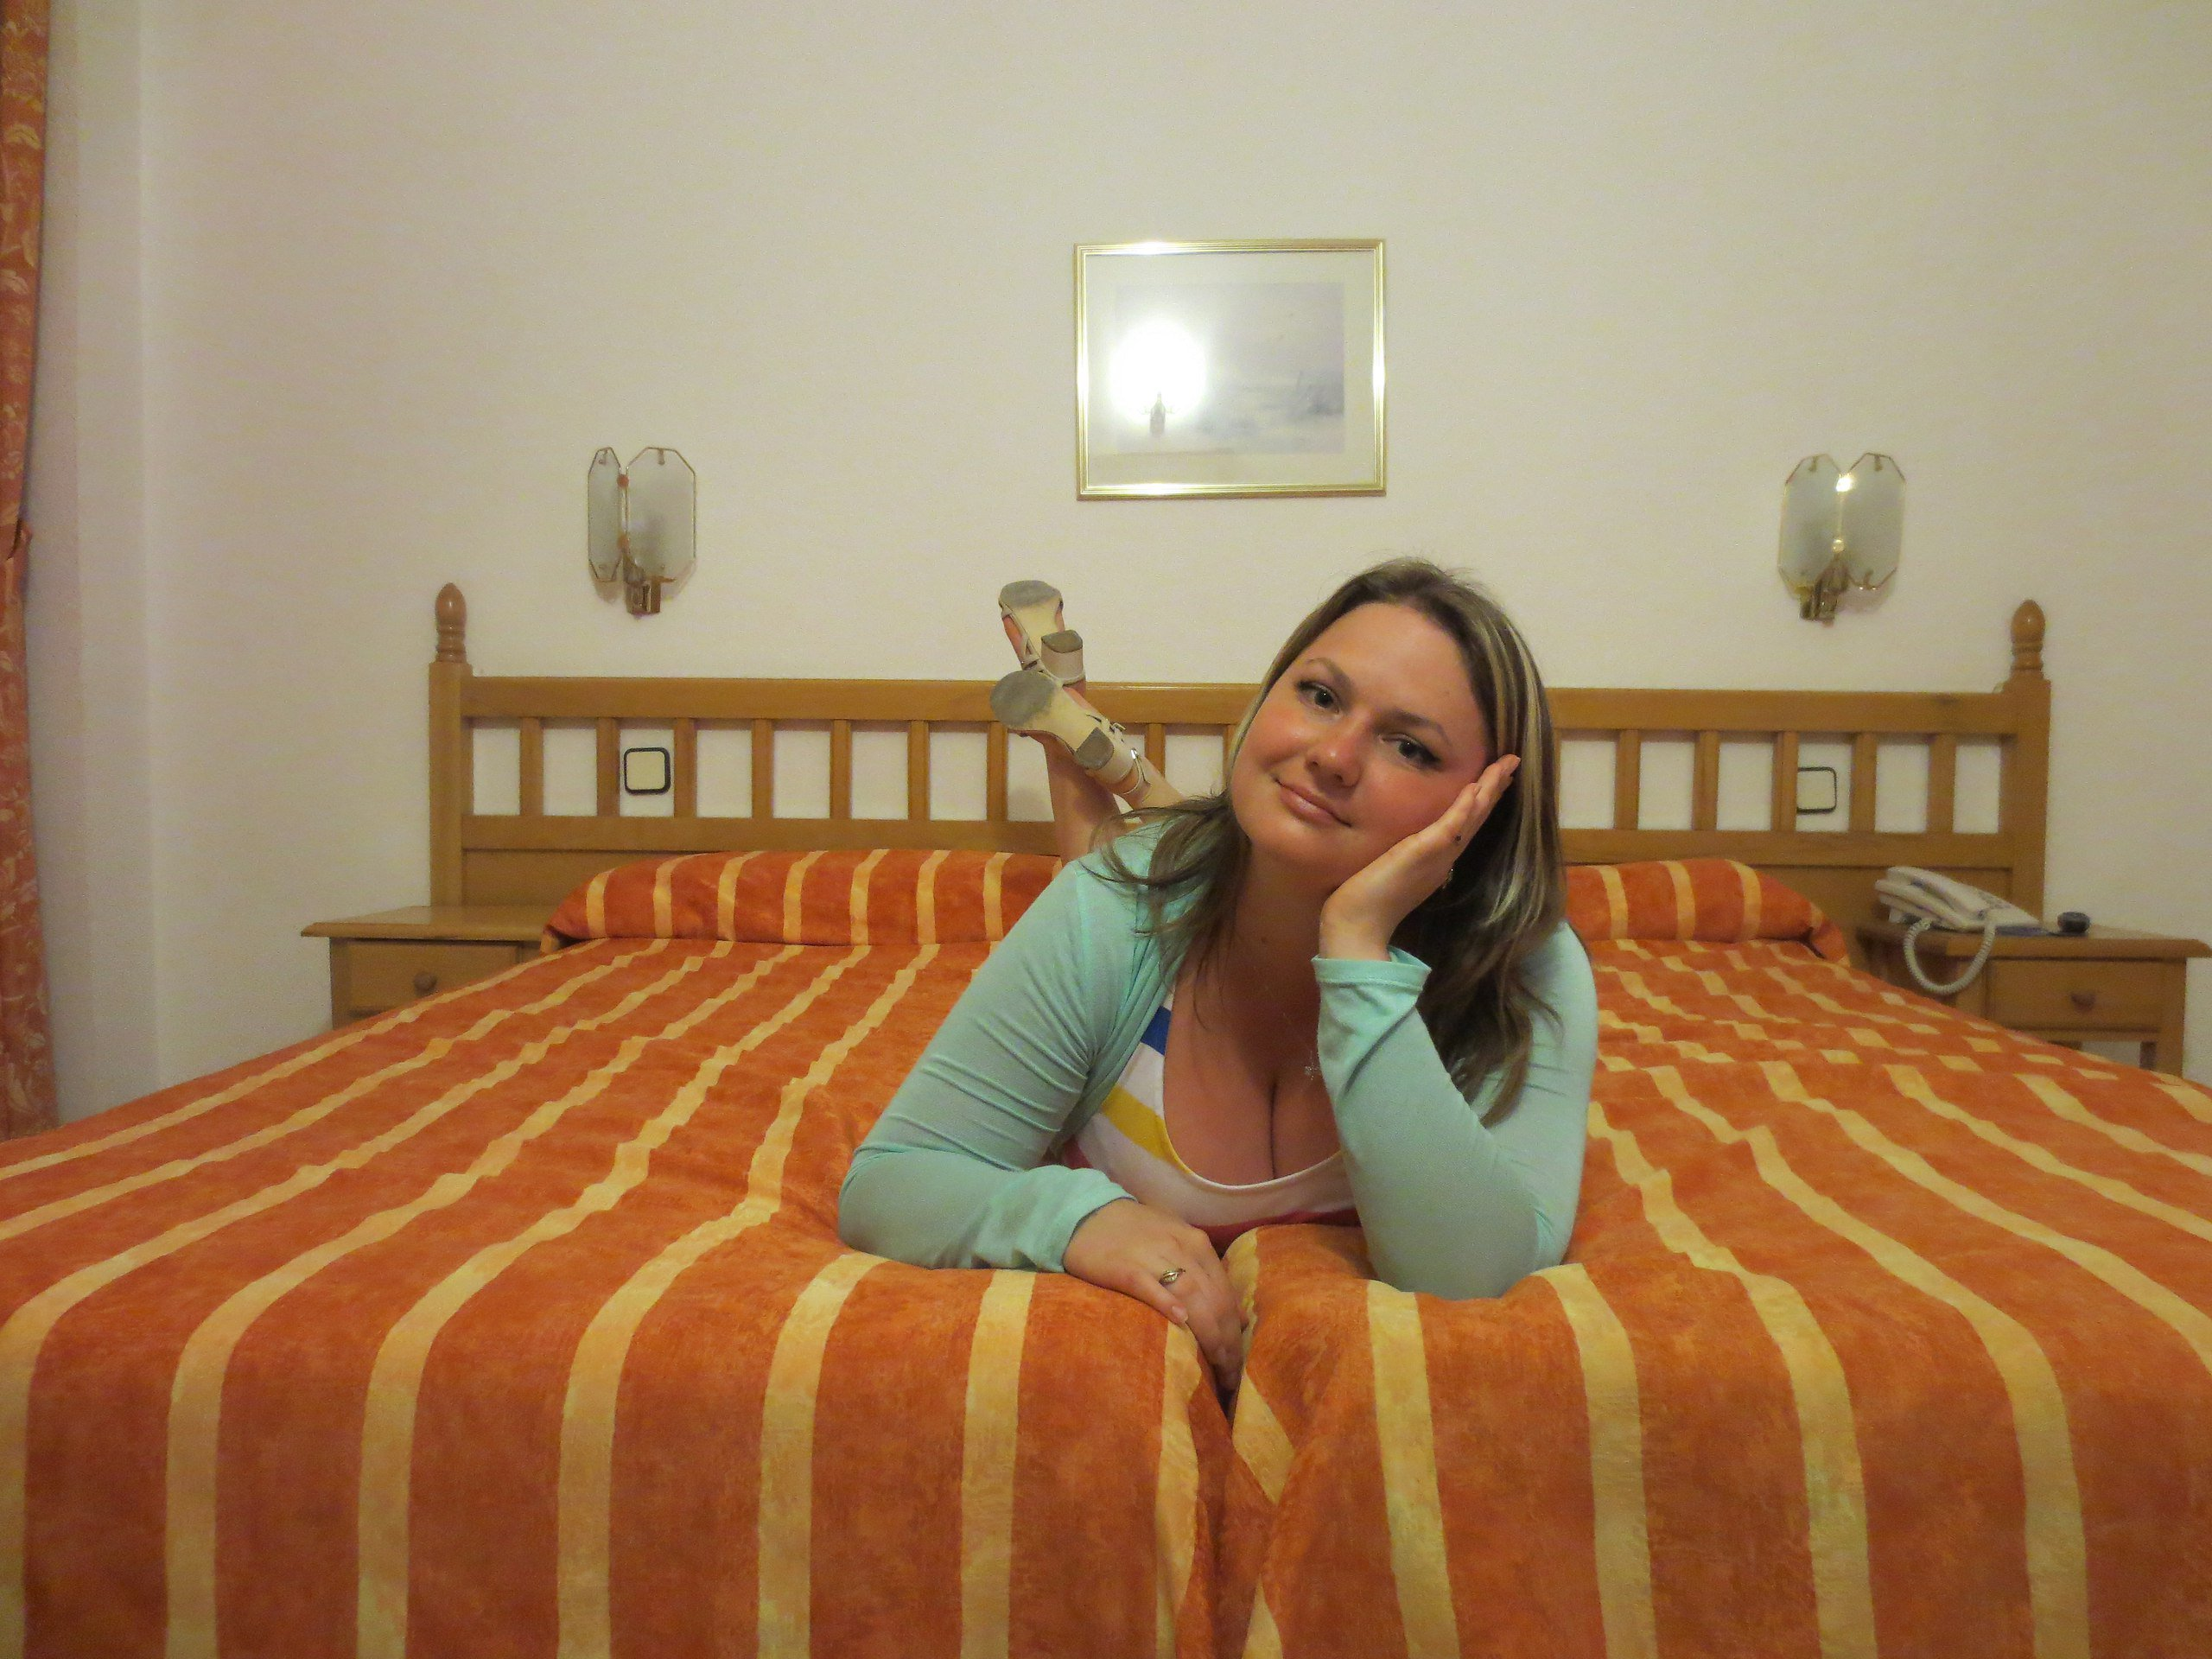 Домашние фото женщин (23 фото) - Натали, 34 года, Калининград